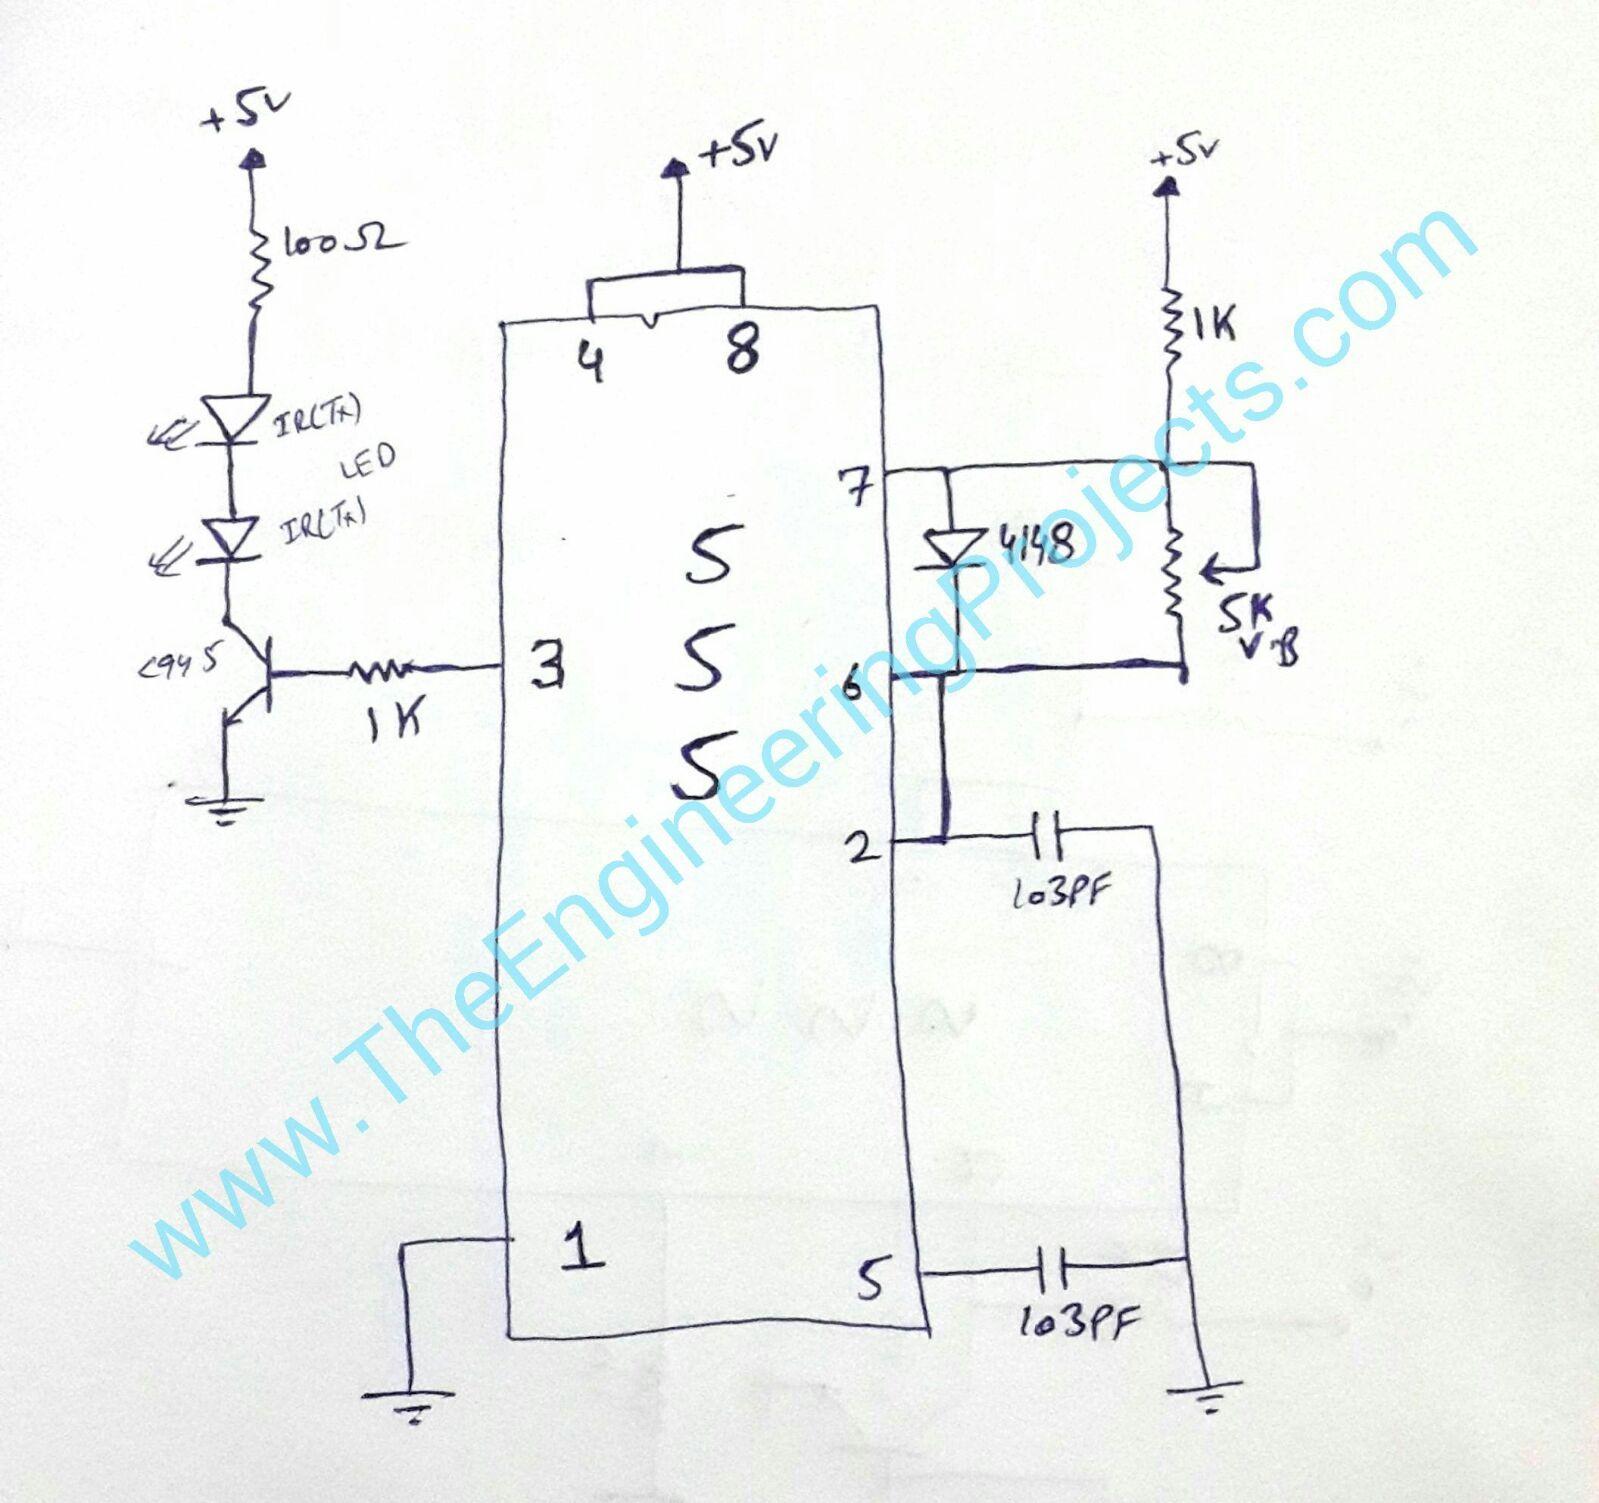 Circuit Diagram Of Ir Sensor Using 555 Timer